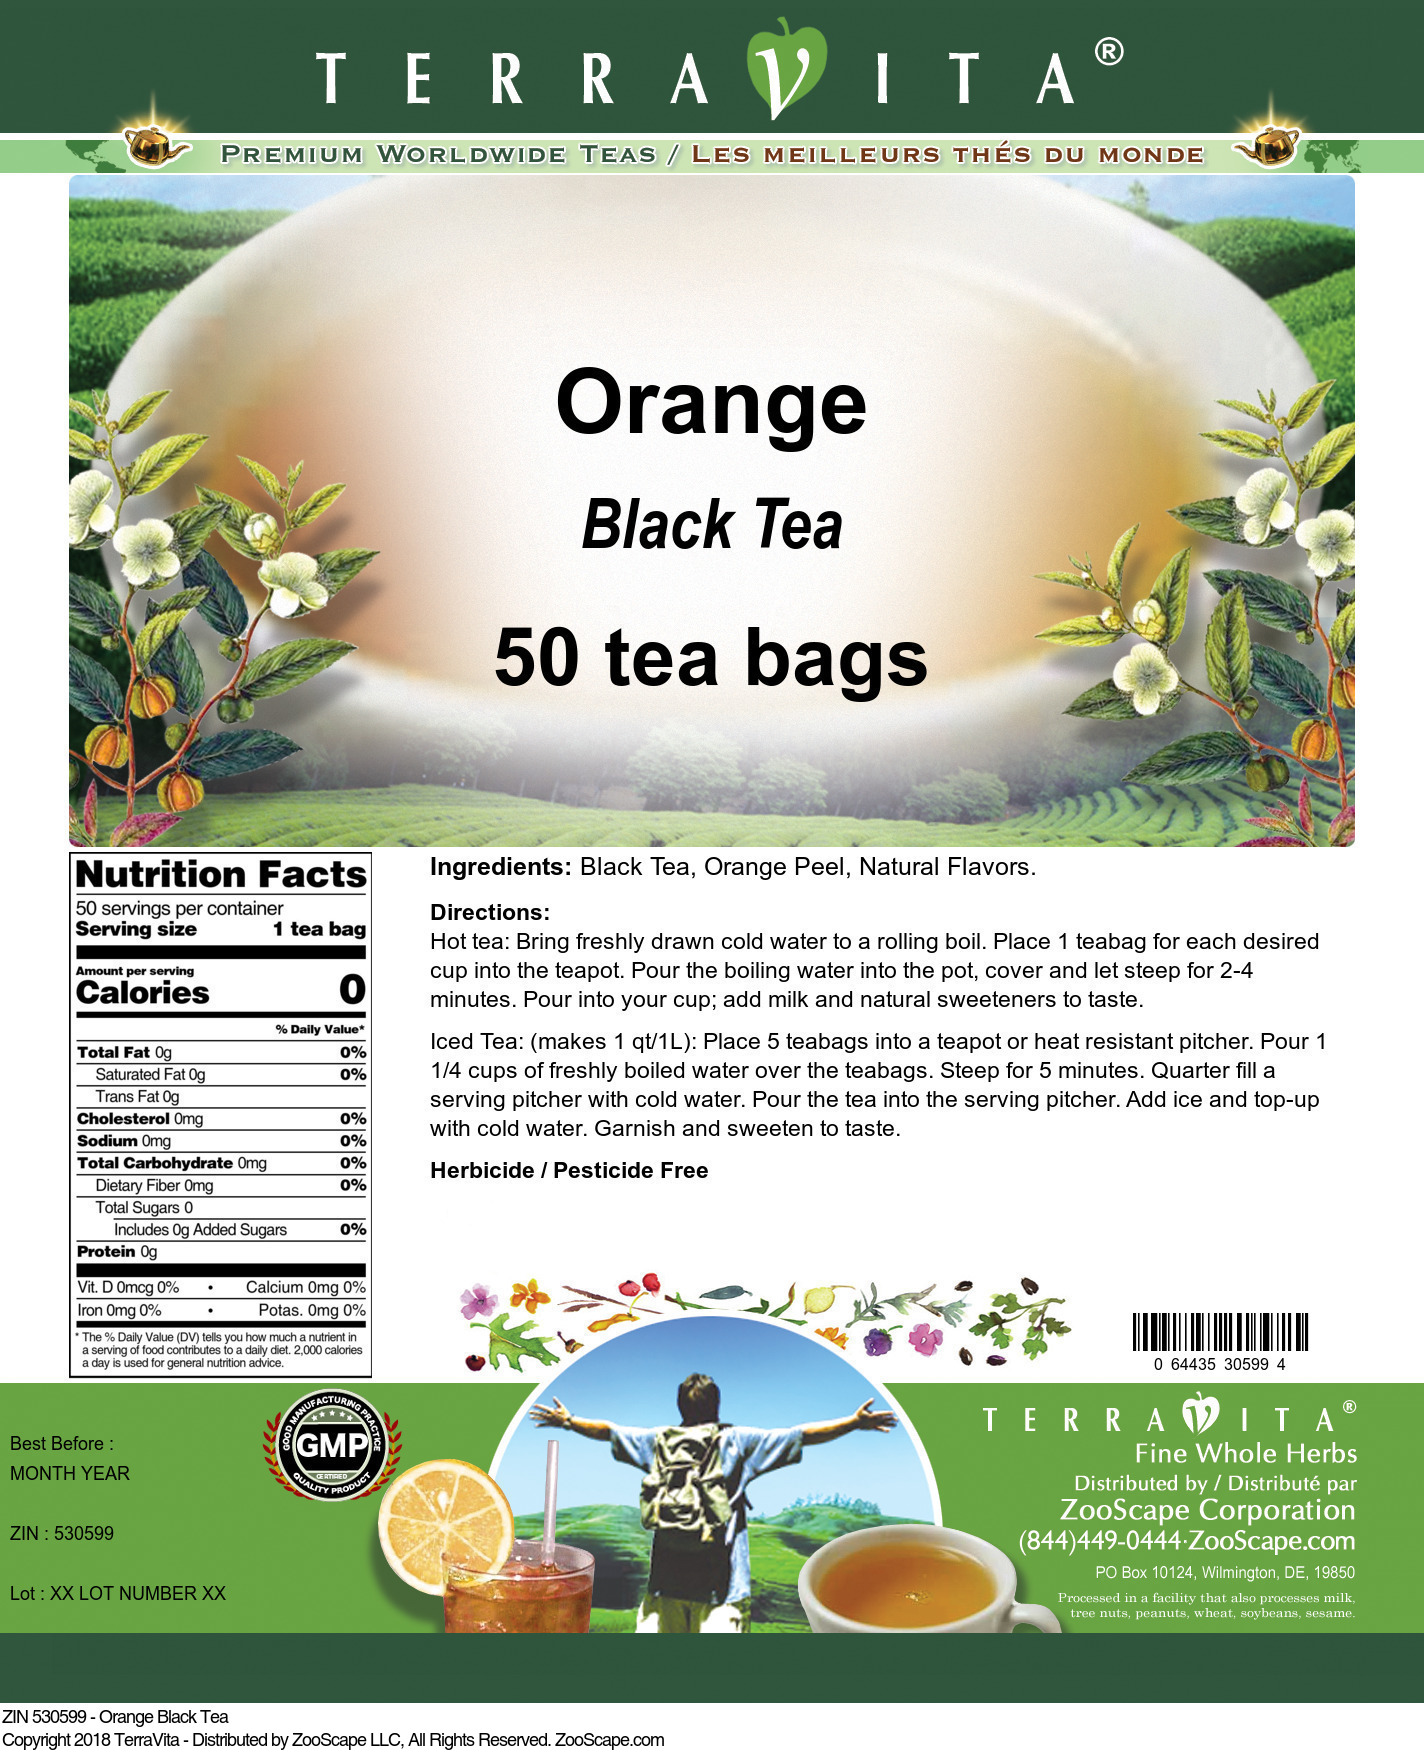 Orange Black Tea